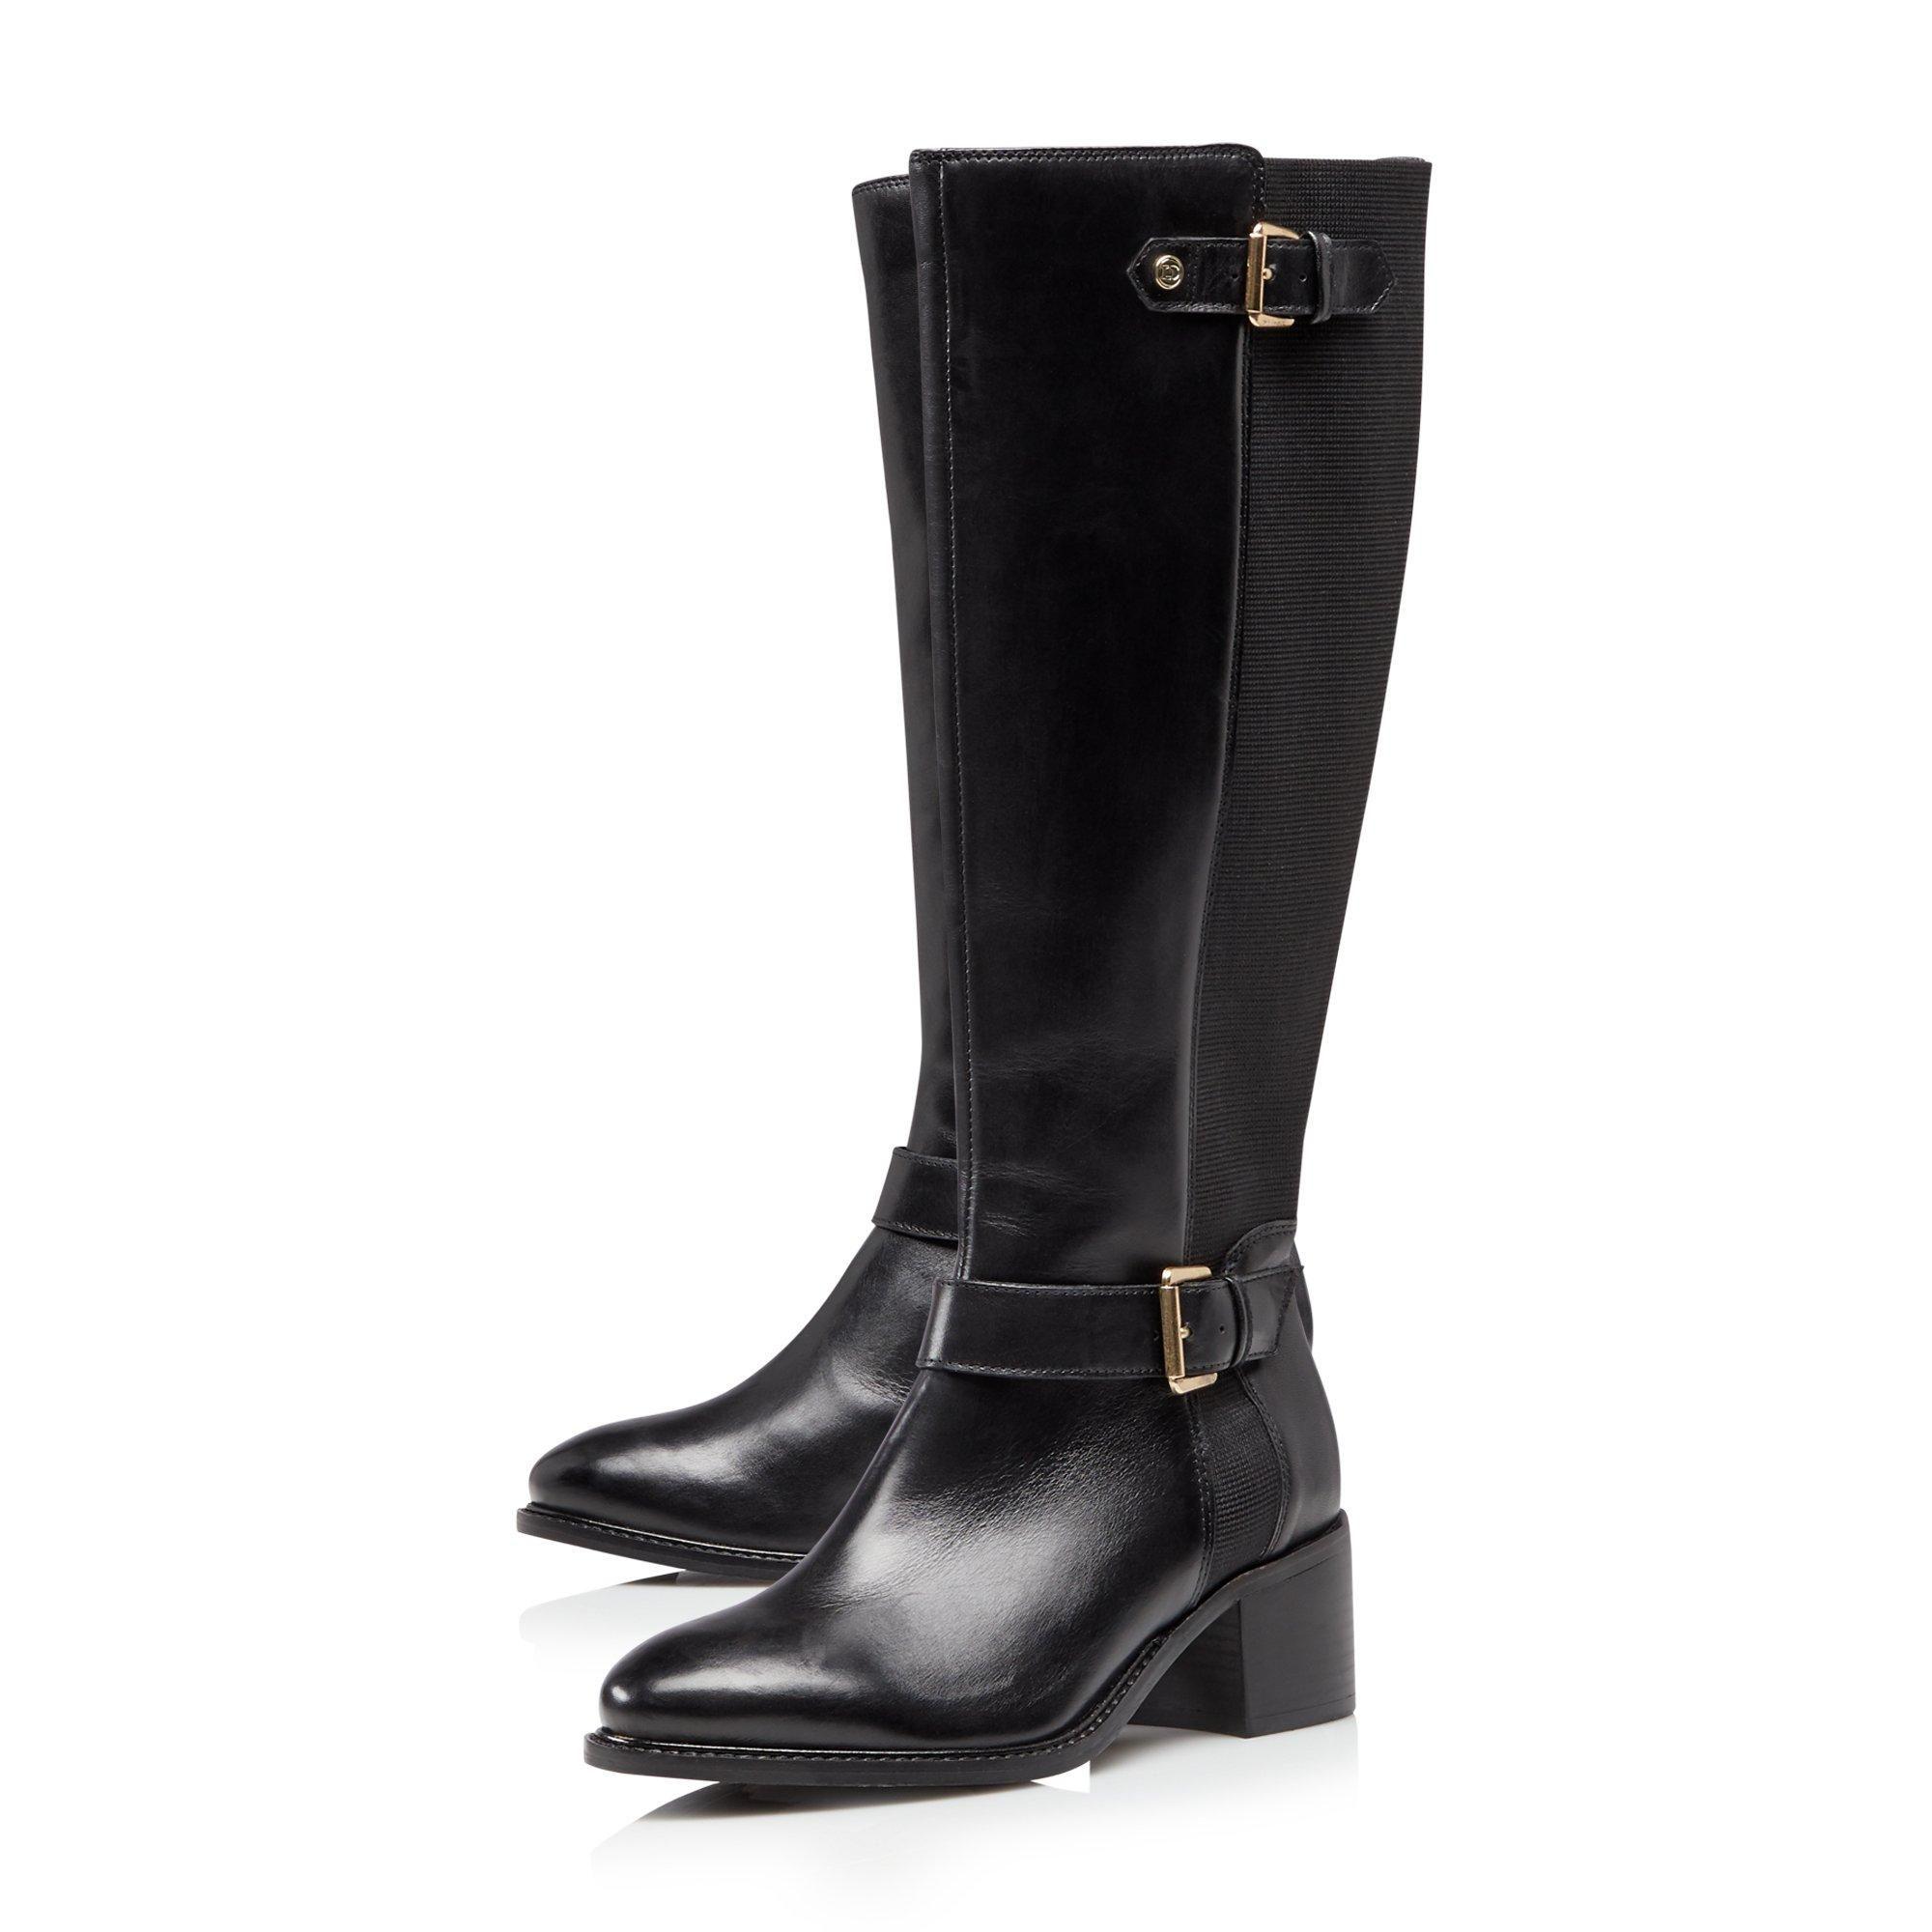 Dune Ladies TILDAS Buckle Strap Detail High Leg Boots